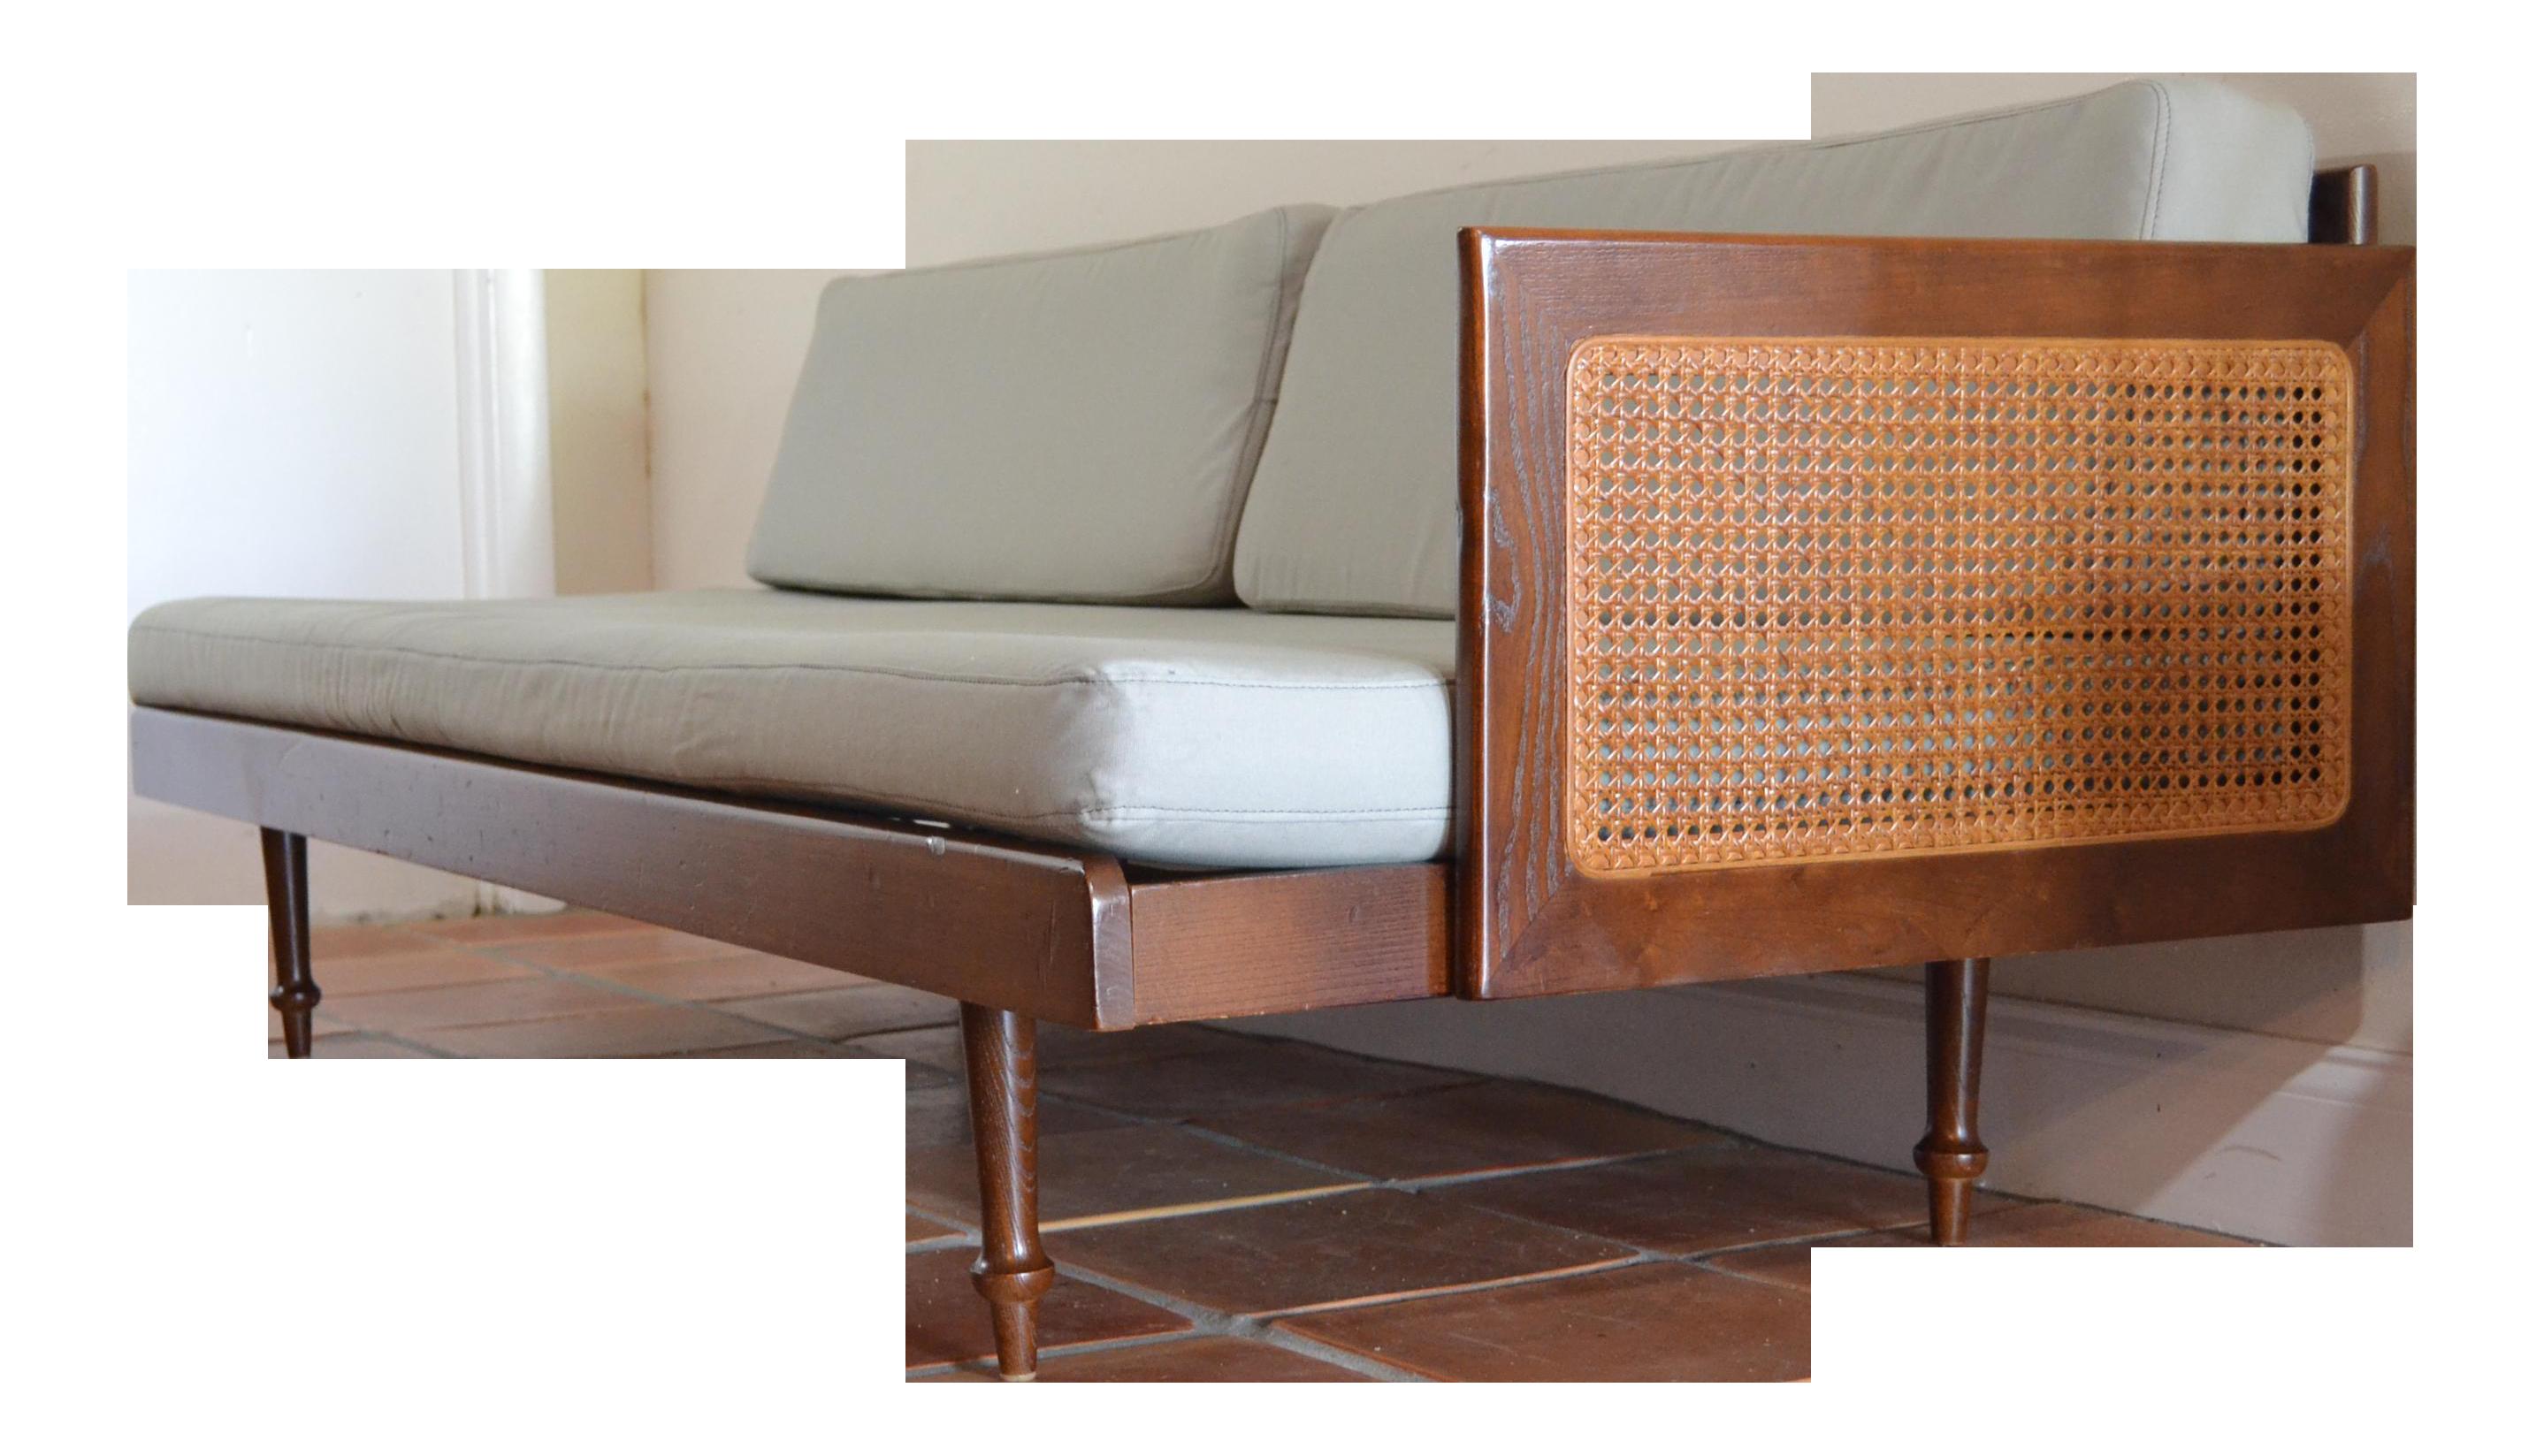 Ordinaire Mid Century Modern Daybed Sleeper Sofa